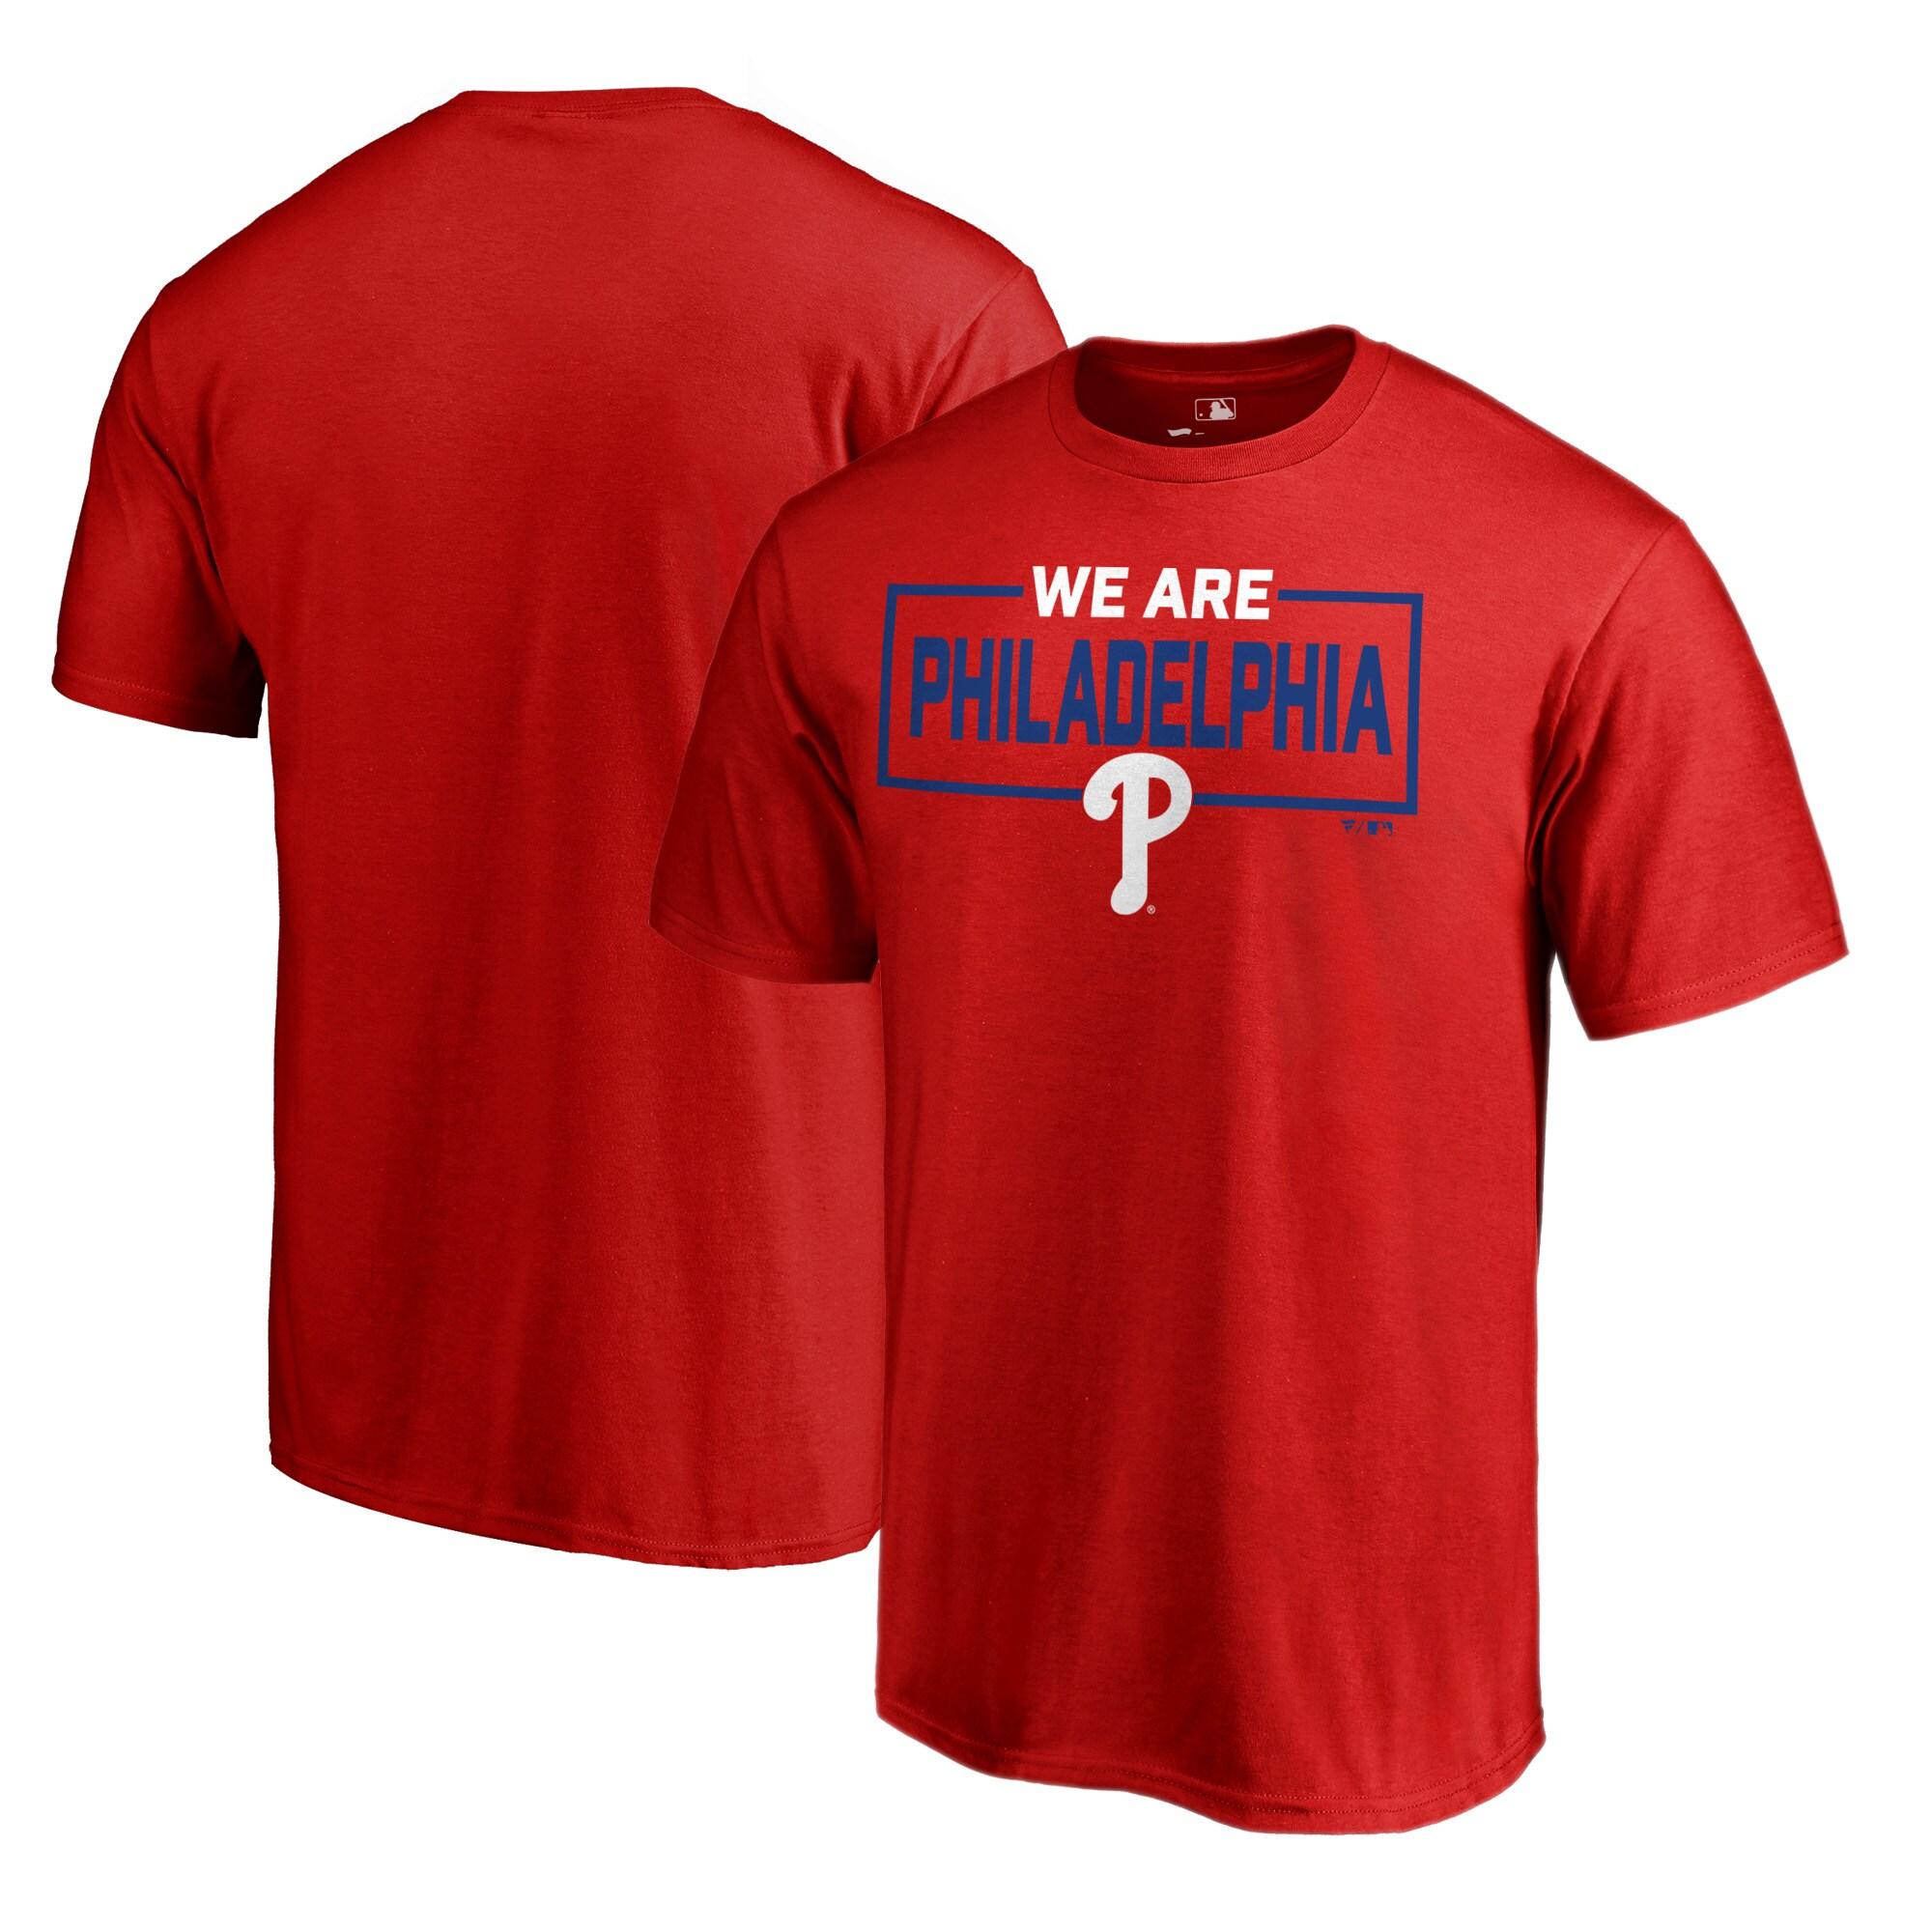 Philadelphia Phillies Fanatics Branded Big & Tall We Are Icon T-Shirt - Red